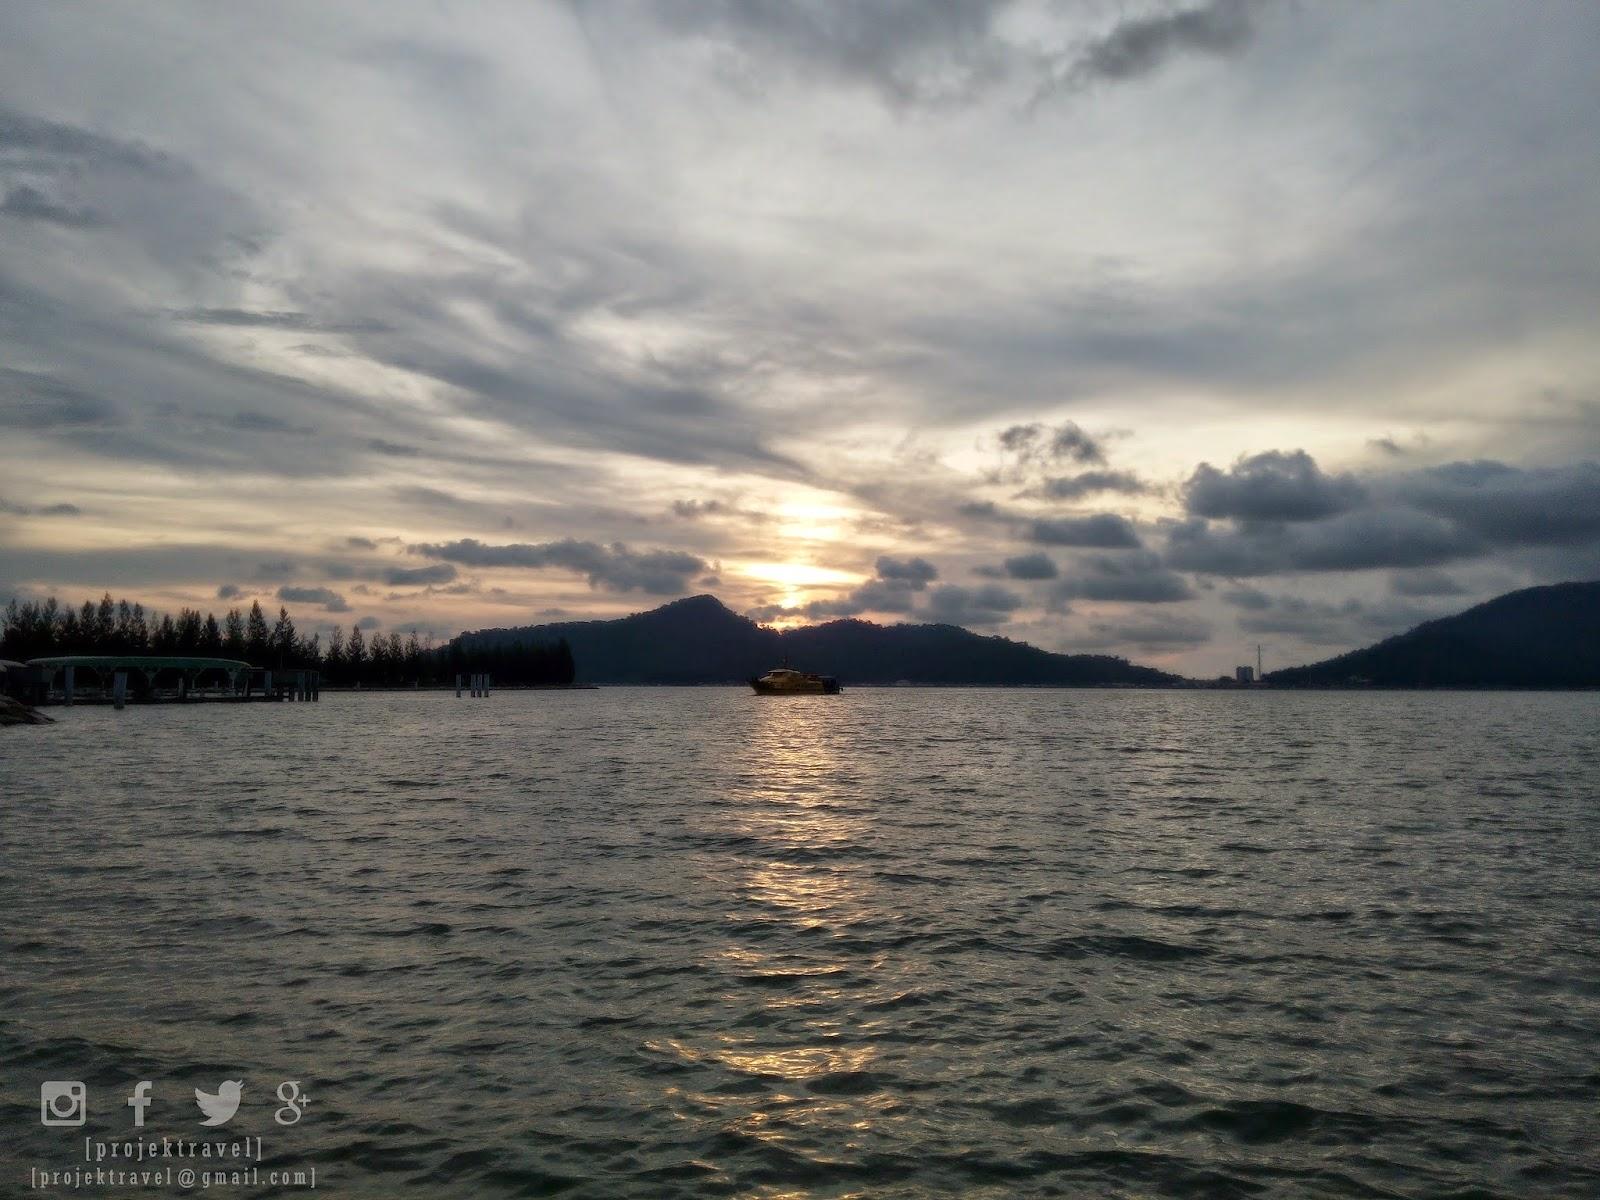 Marina Island Pangkor Di Atas Pulau Buatan